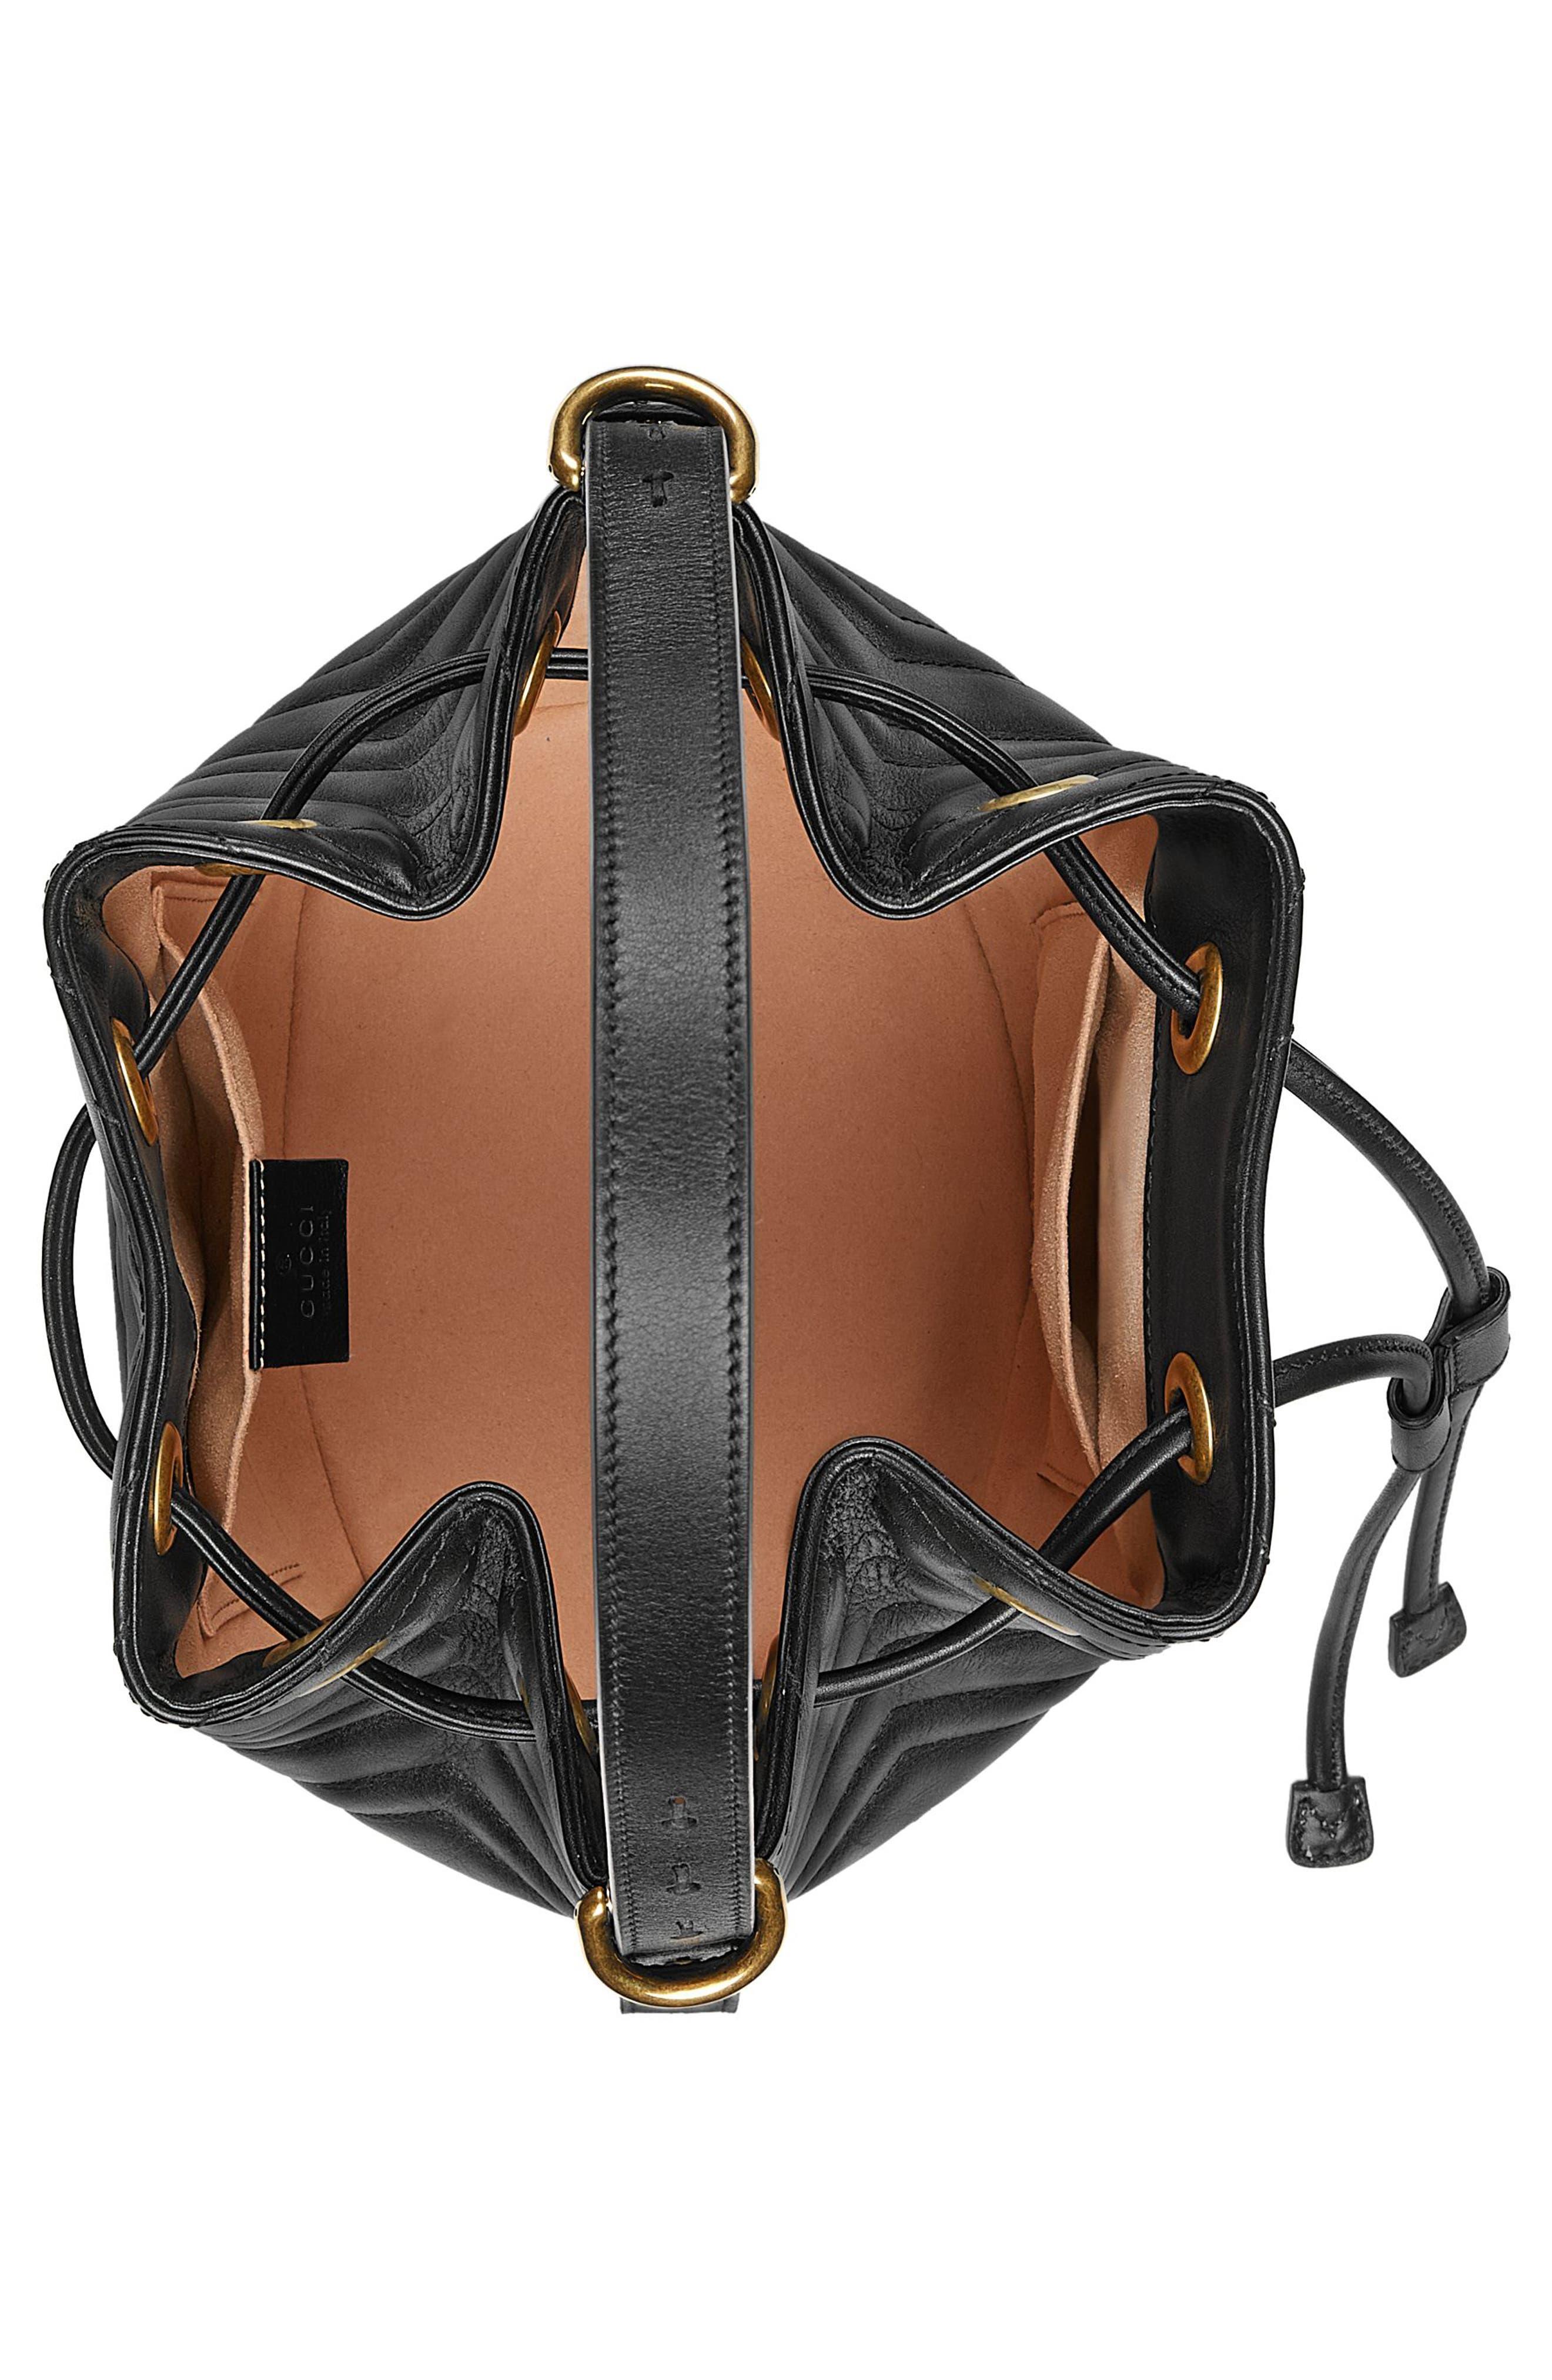 GG Marmont 2.0 Matelassé Leather Bucket Bag,                             Alternate thumbnail 3, color,                             Nero